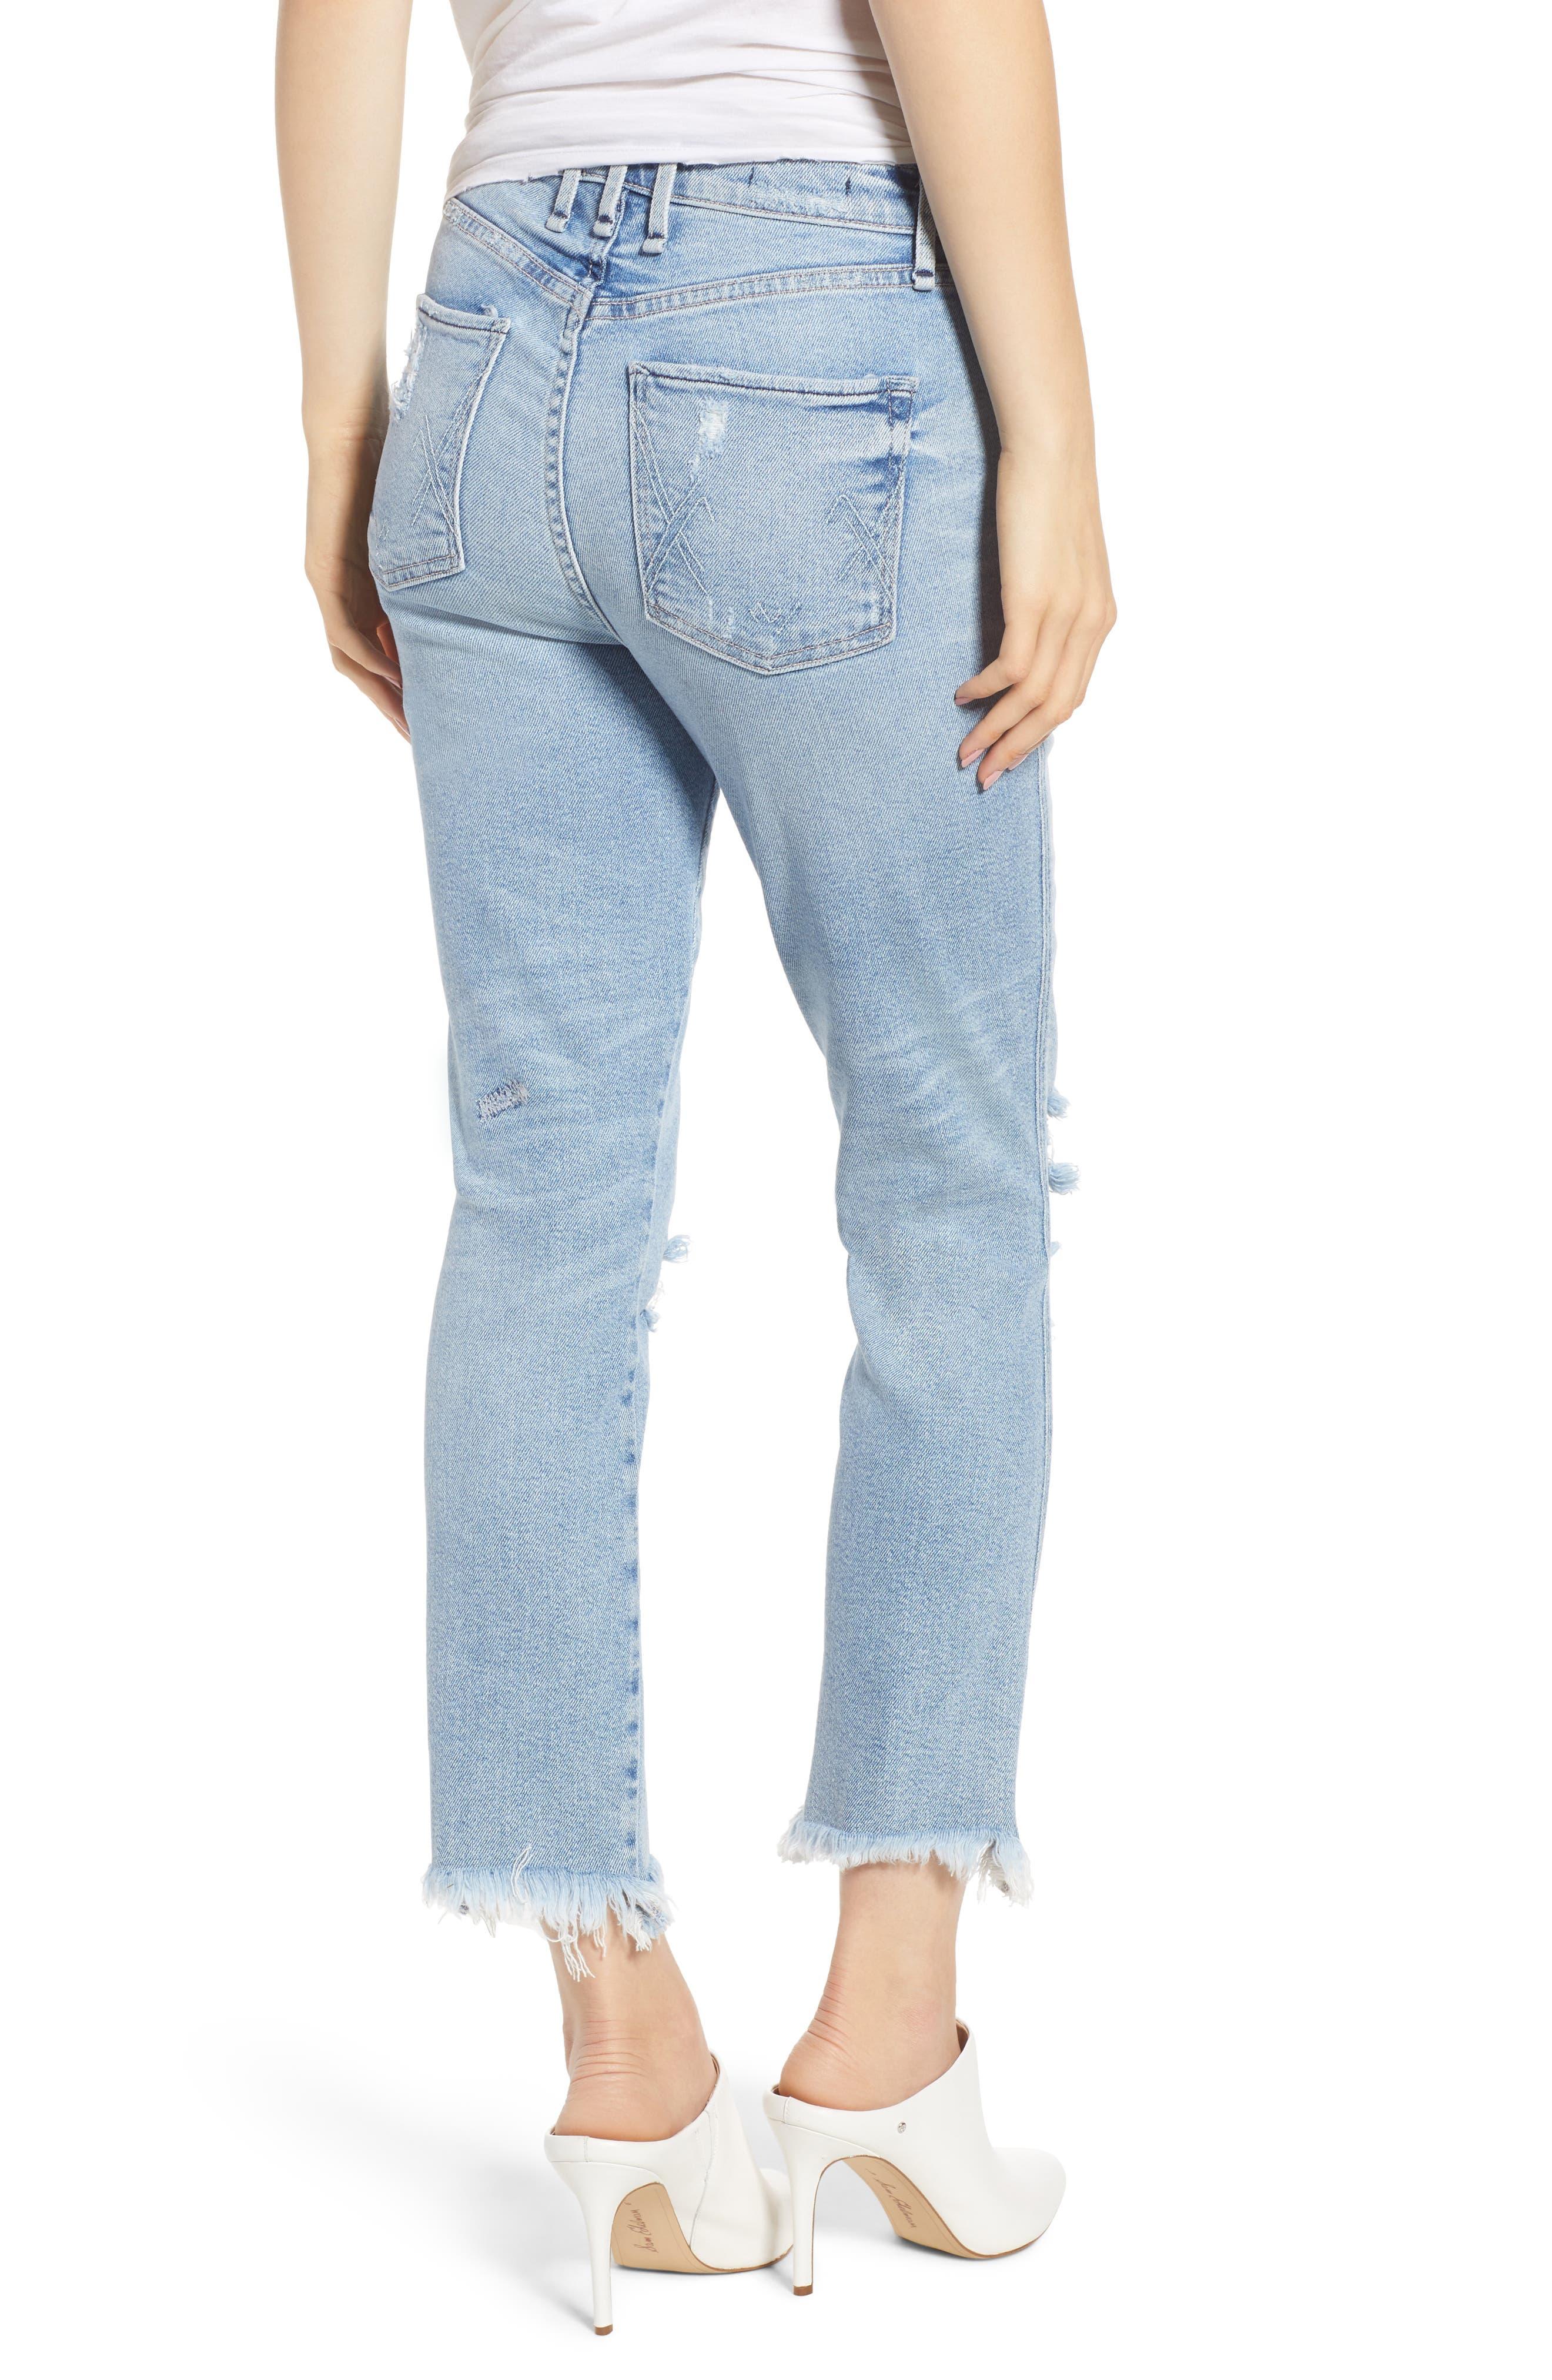 Valetta High Waist Crop Straight Leg Jeans,                             Alternate thumbnail 2, color,                             450